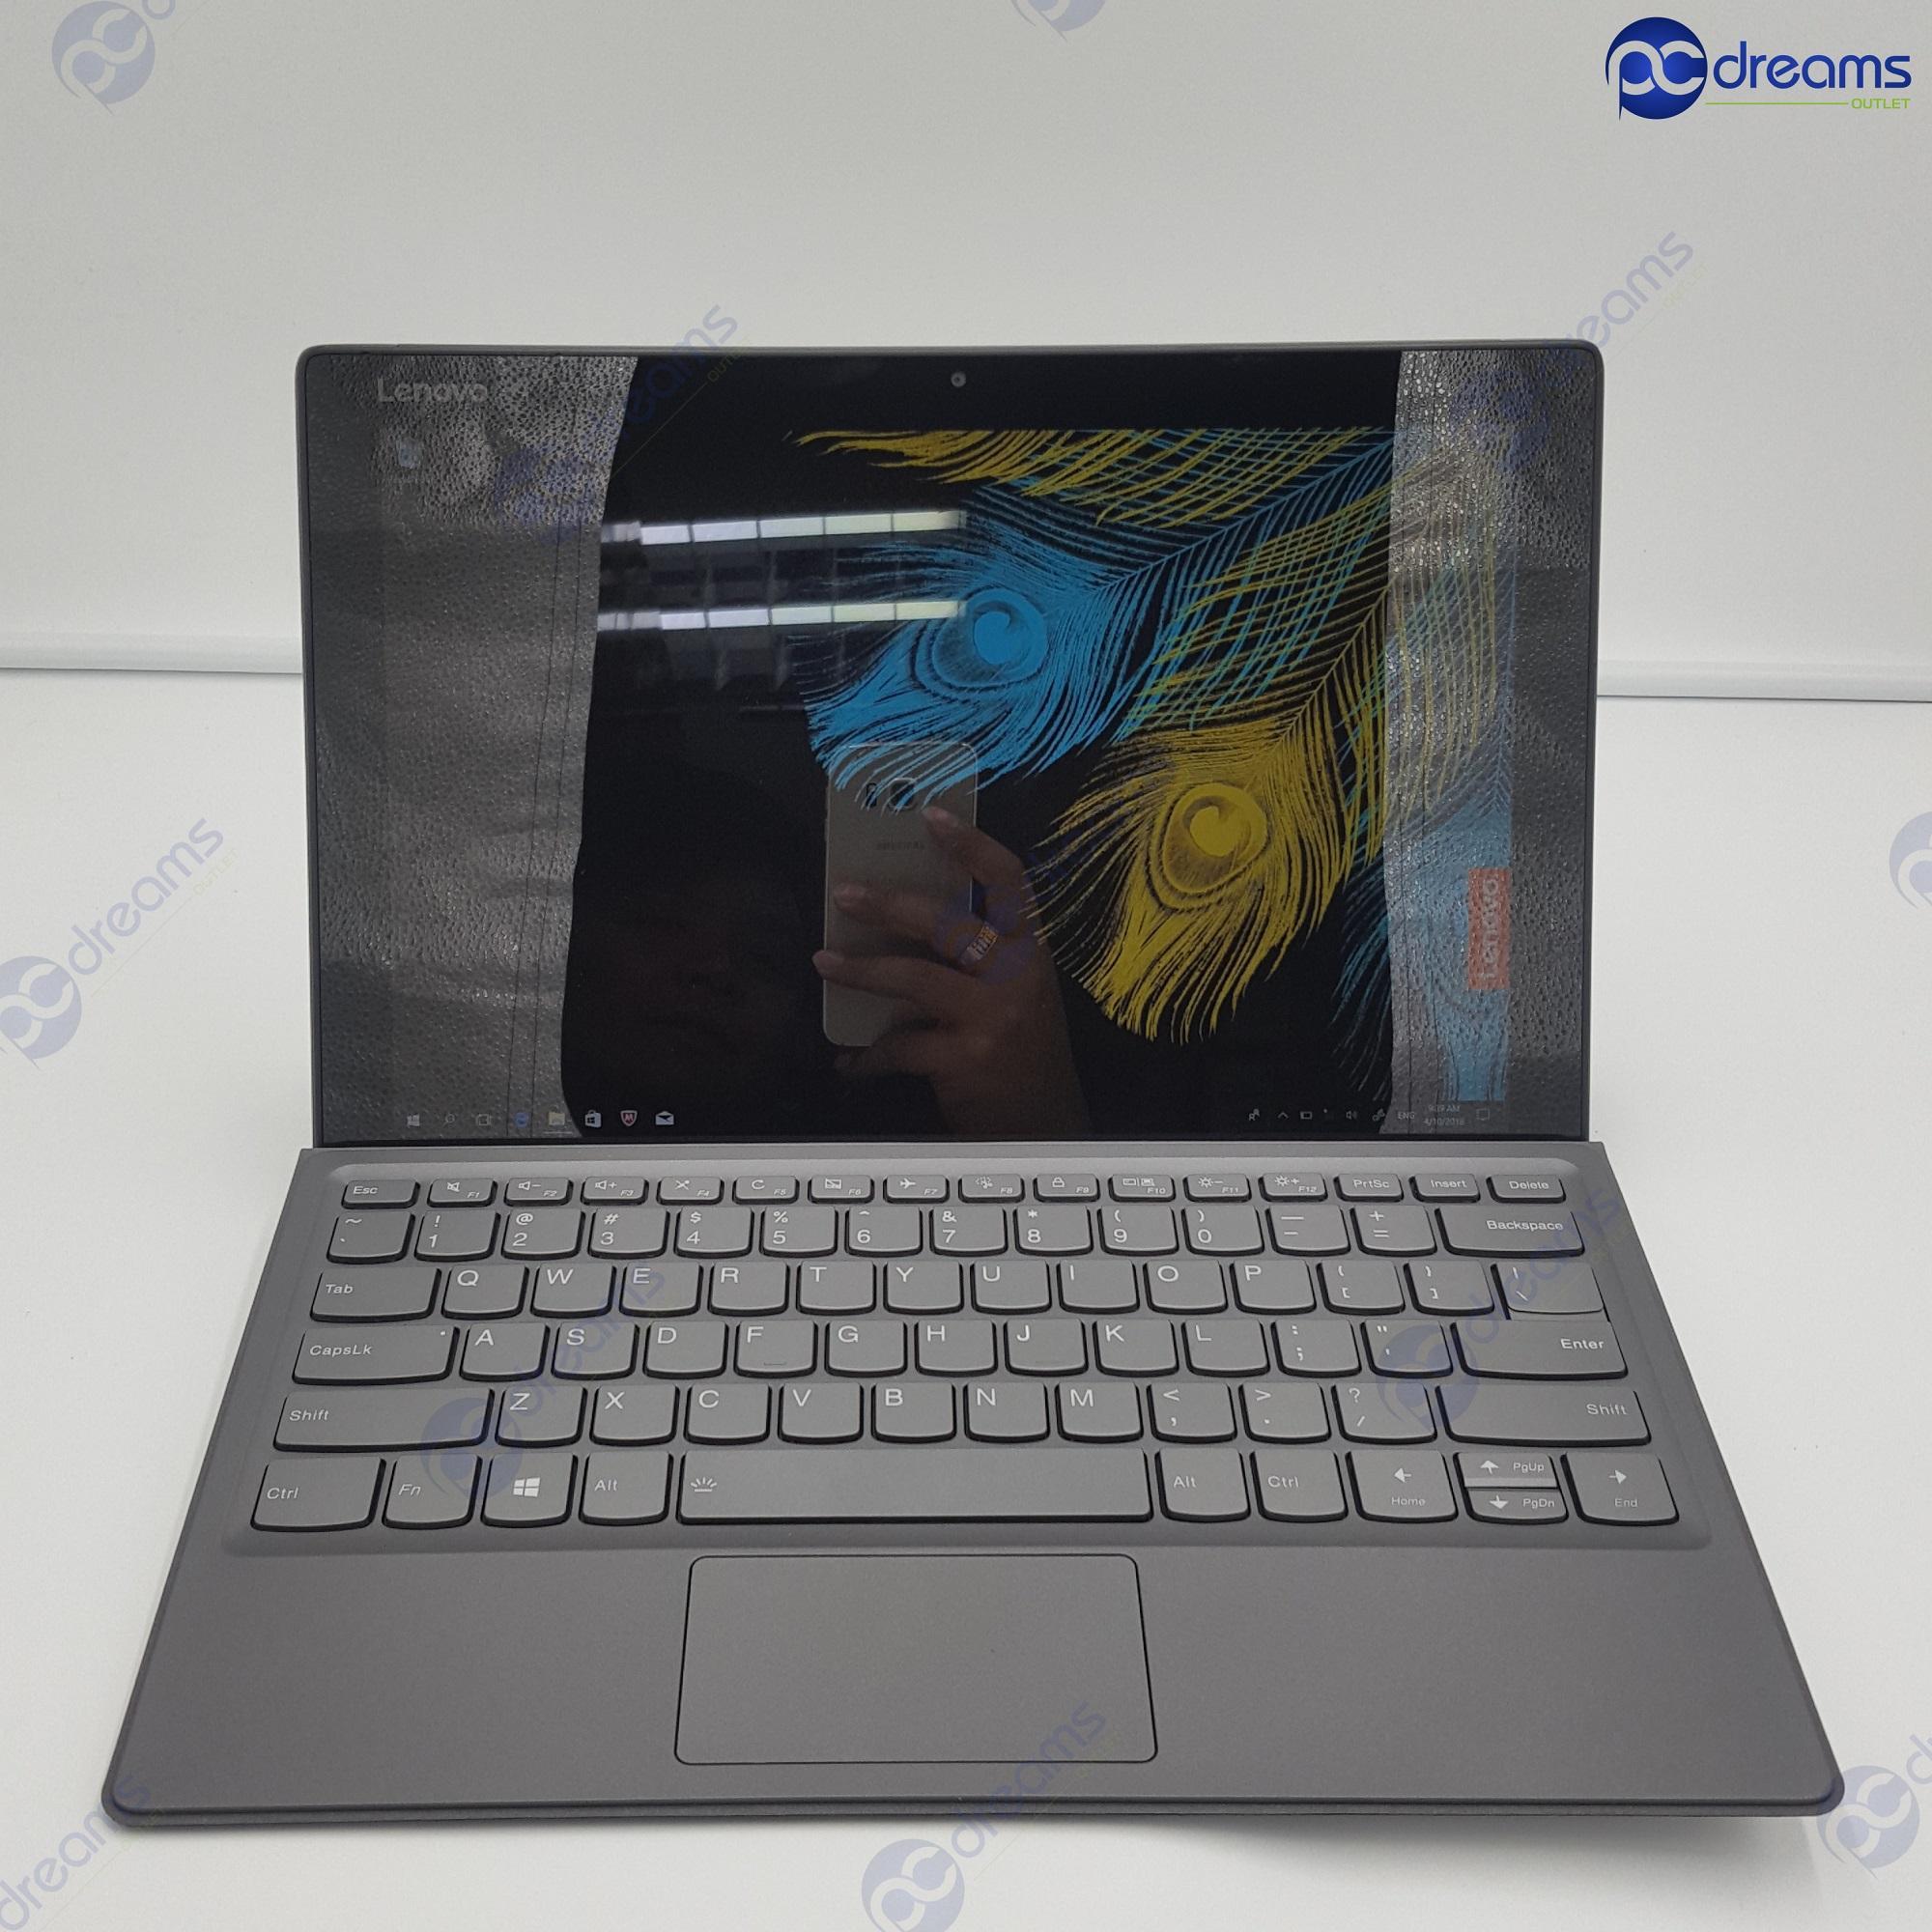 LENOVO IDEAPAD MIIX 520-12IKB (81CG021VSB) i5-8250U/8GB/256GB SSD [Premium Refreshed]